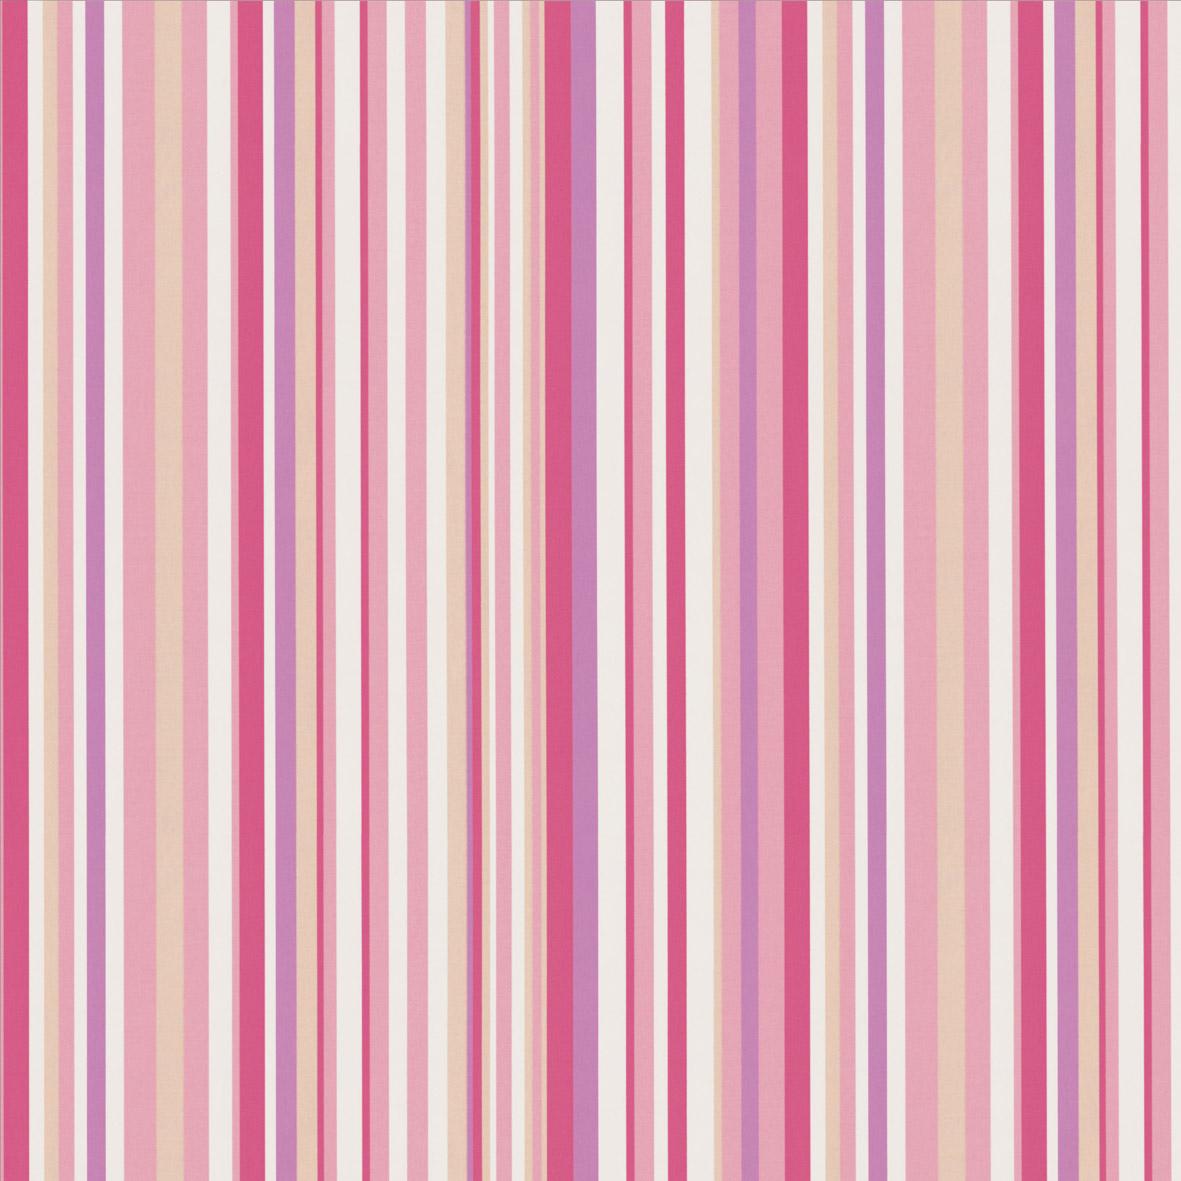 Roller_Swatch_Funky_Stripe_Blacjout_Candy_RE9476